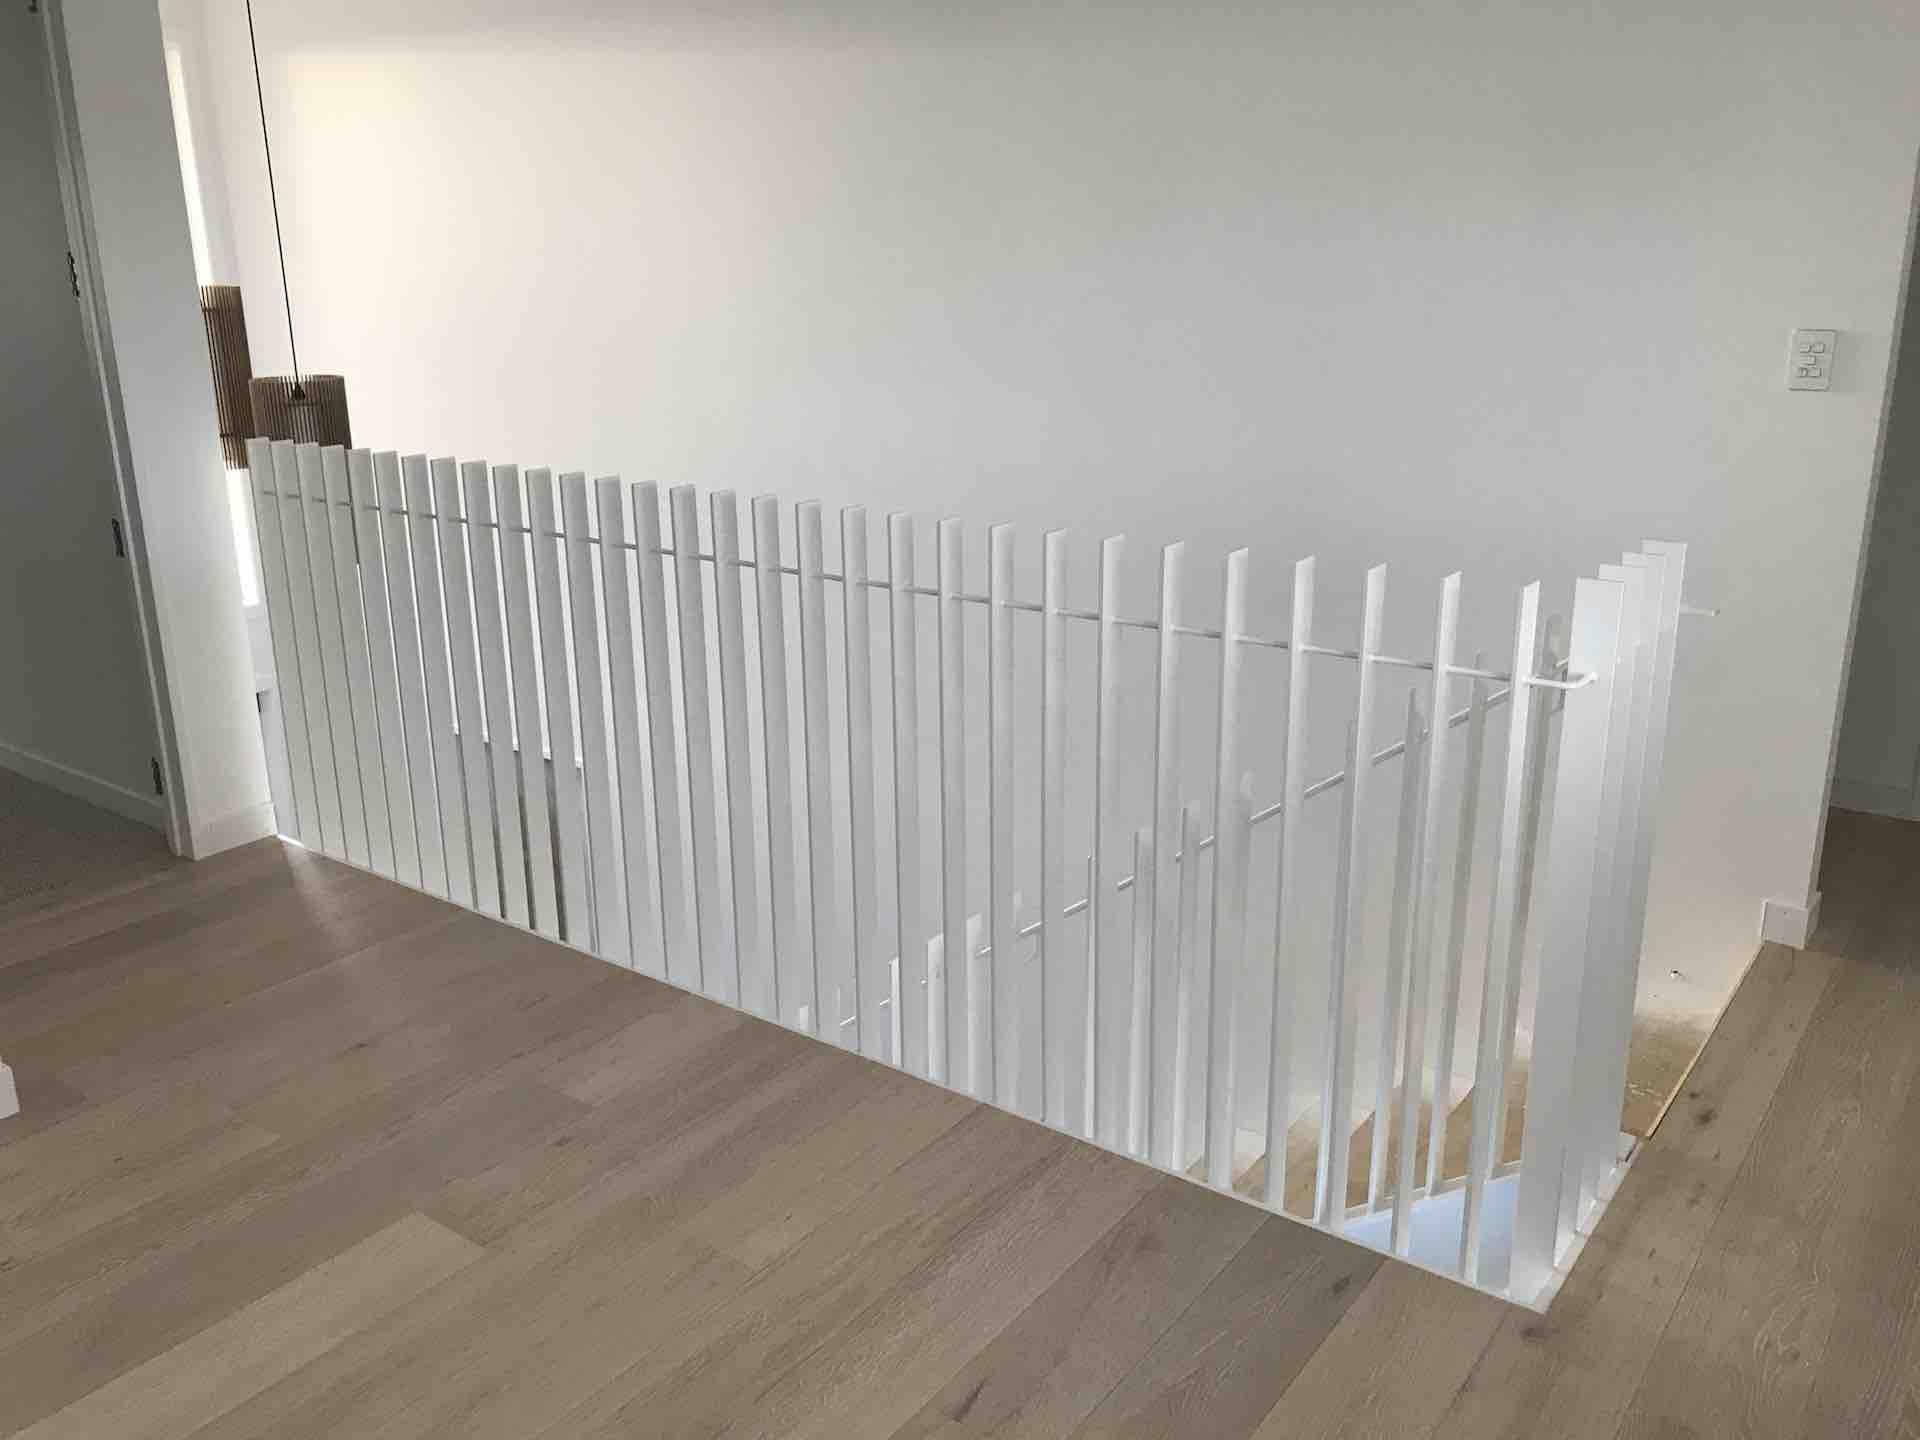 Steel balustrade powder coated in white